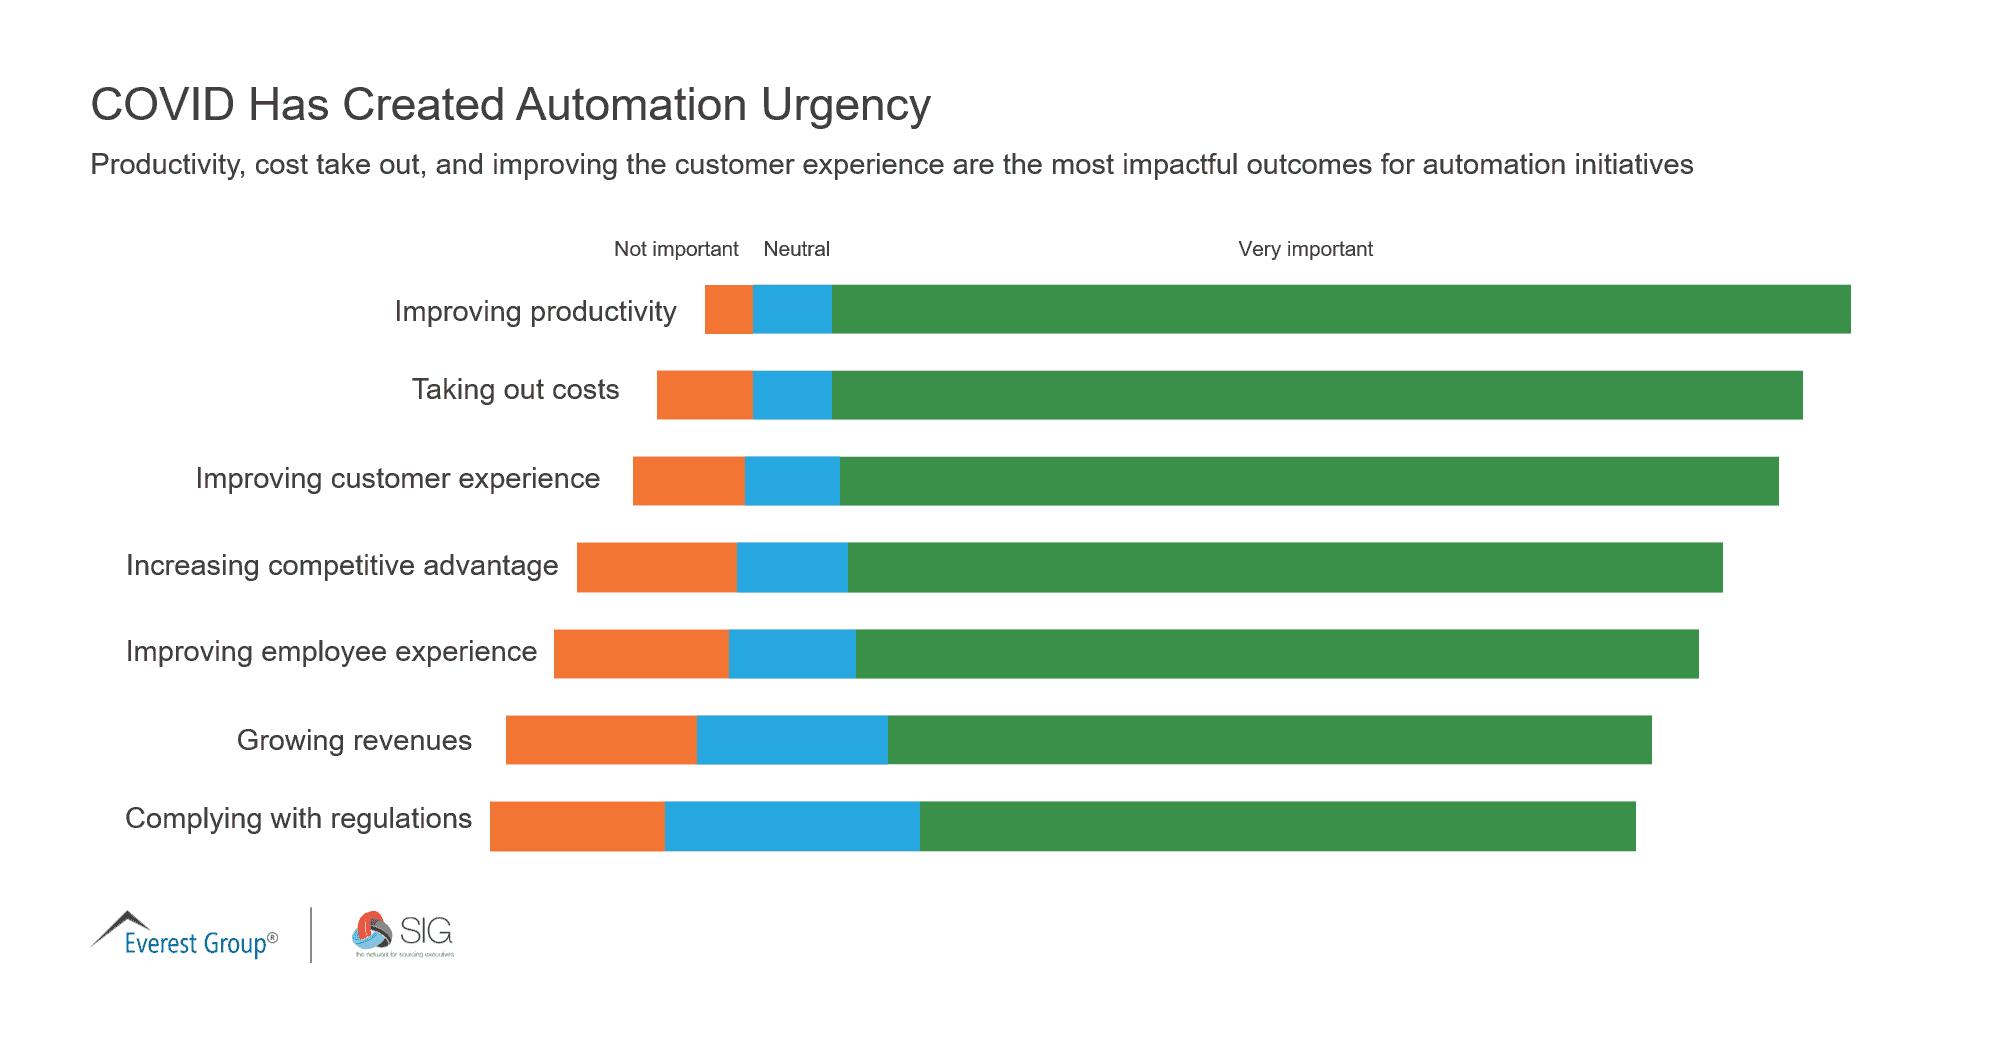 COVID Has Created Automation Urgency SIG